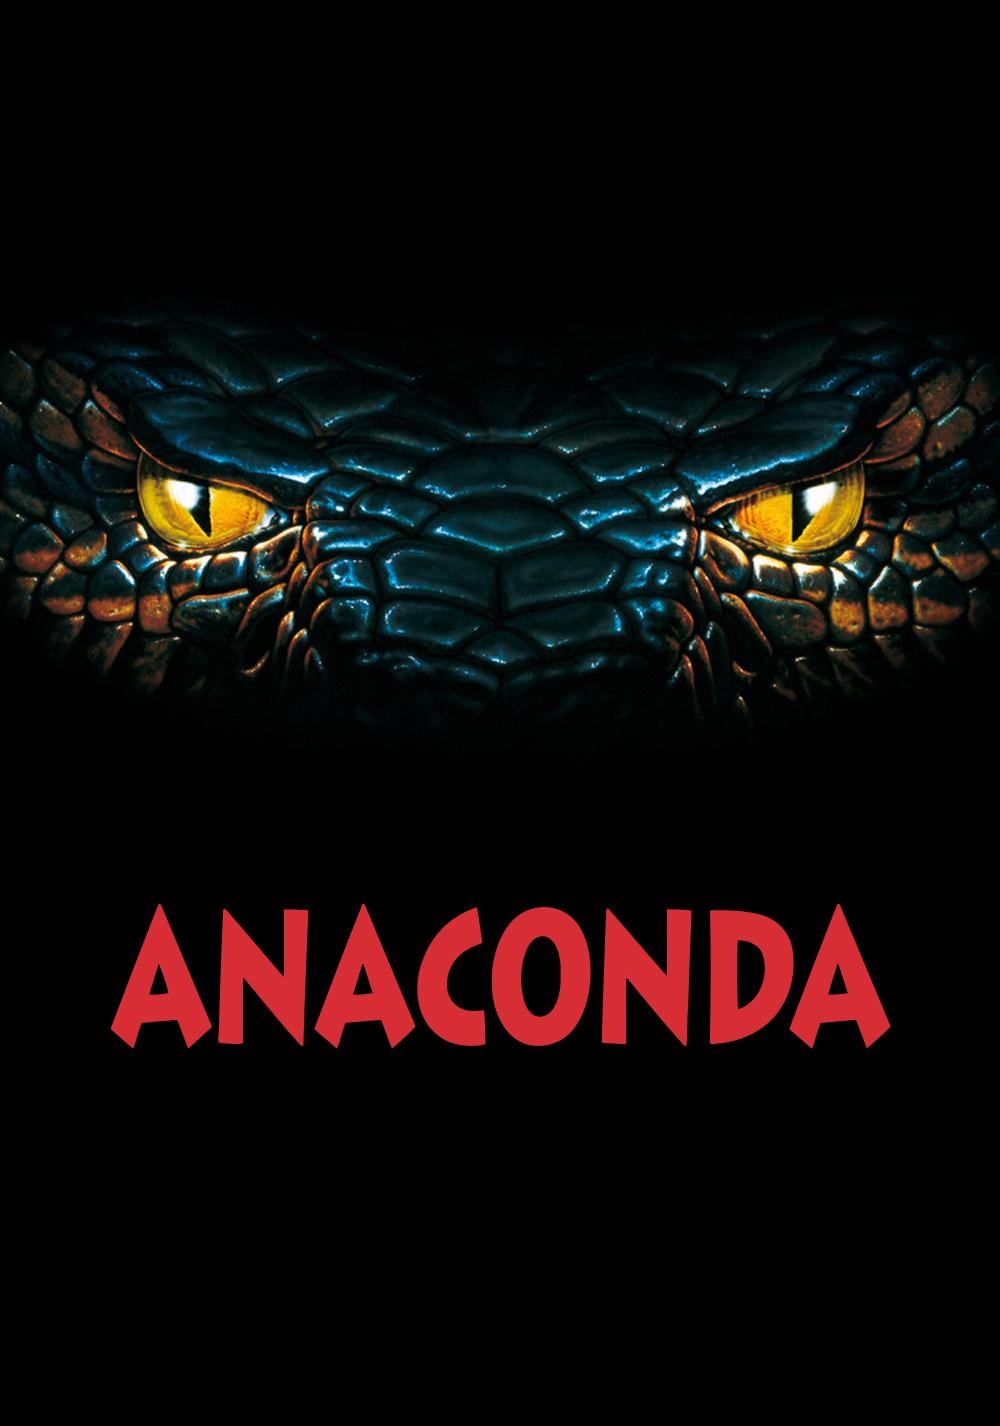 Anaconda 2 Poster Anaconda | Movie fanar...